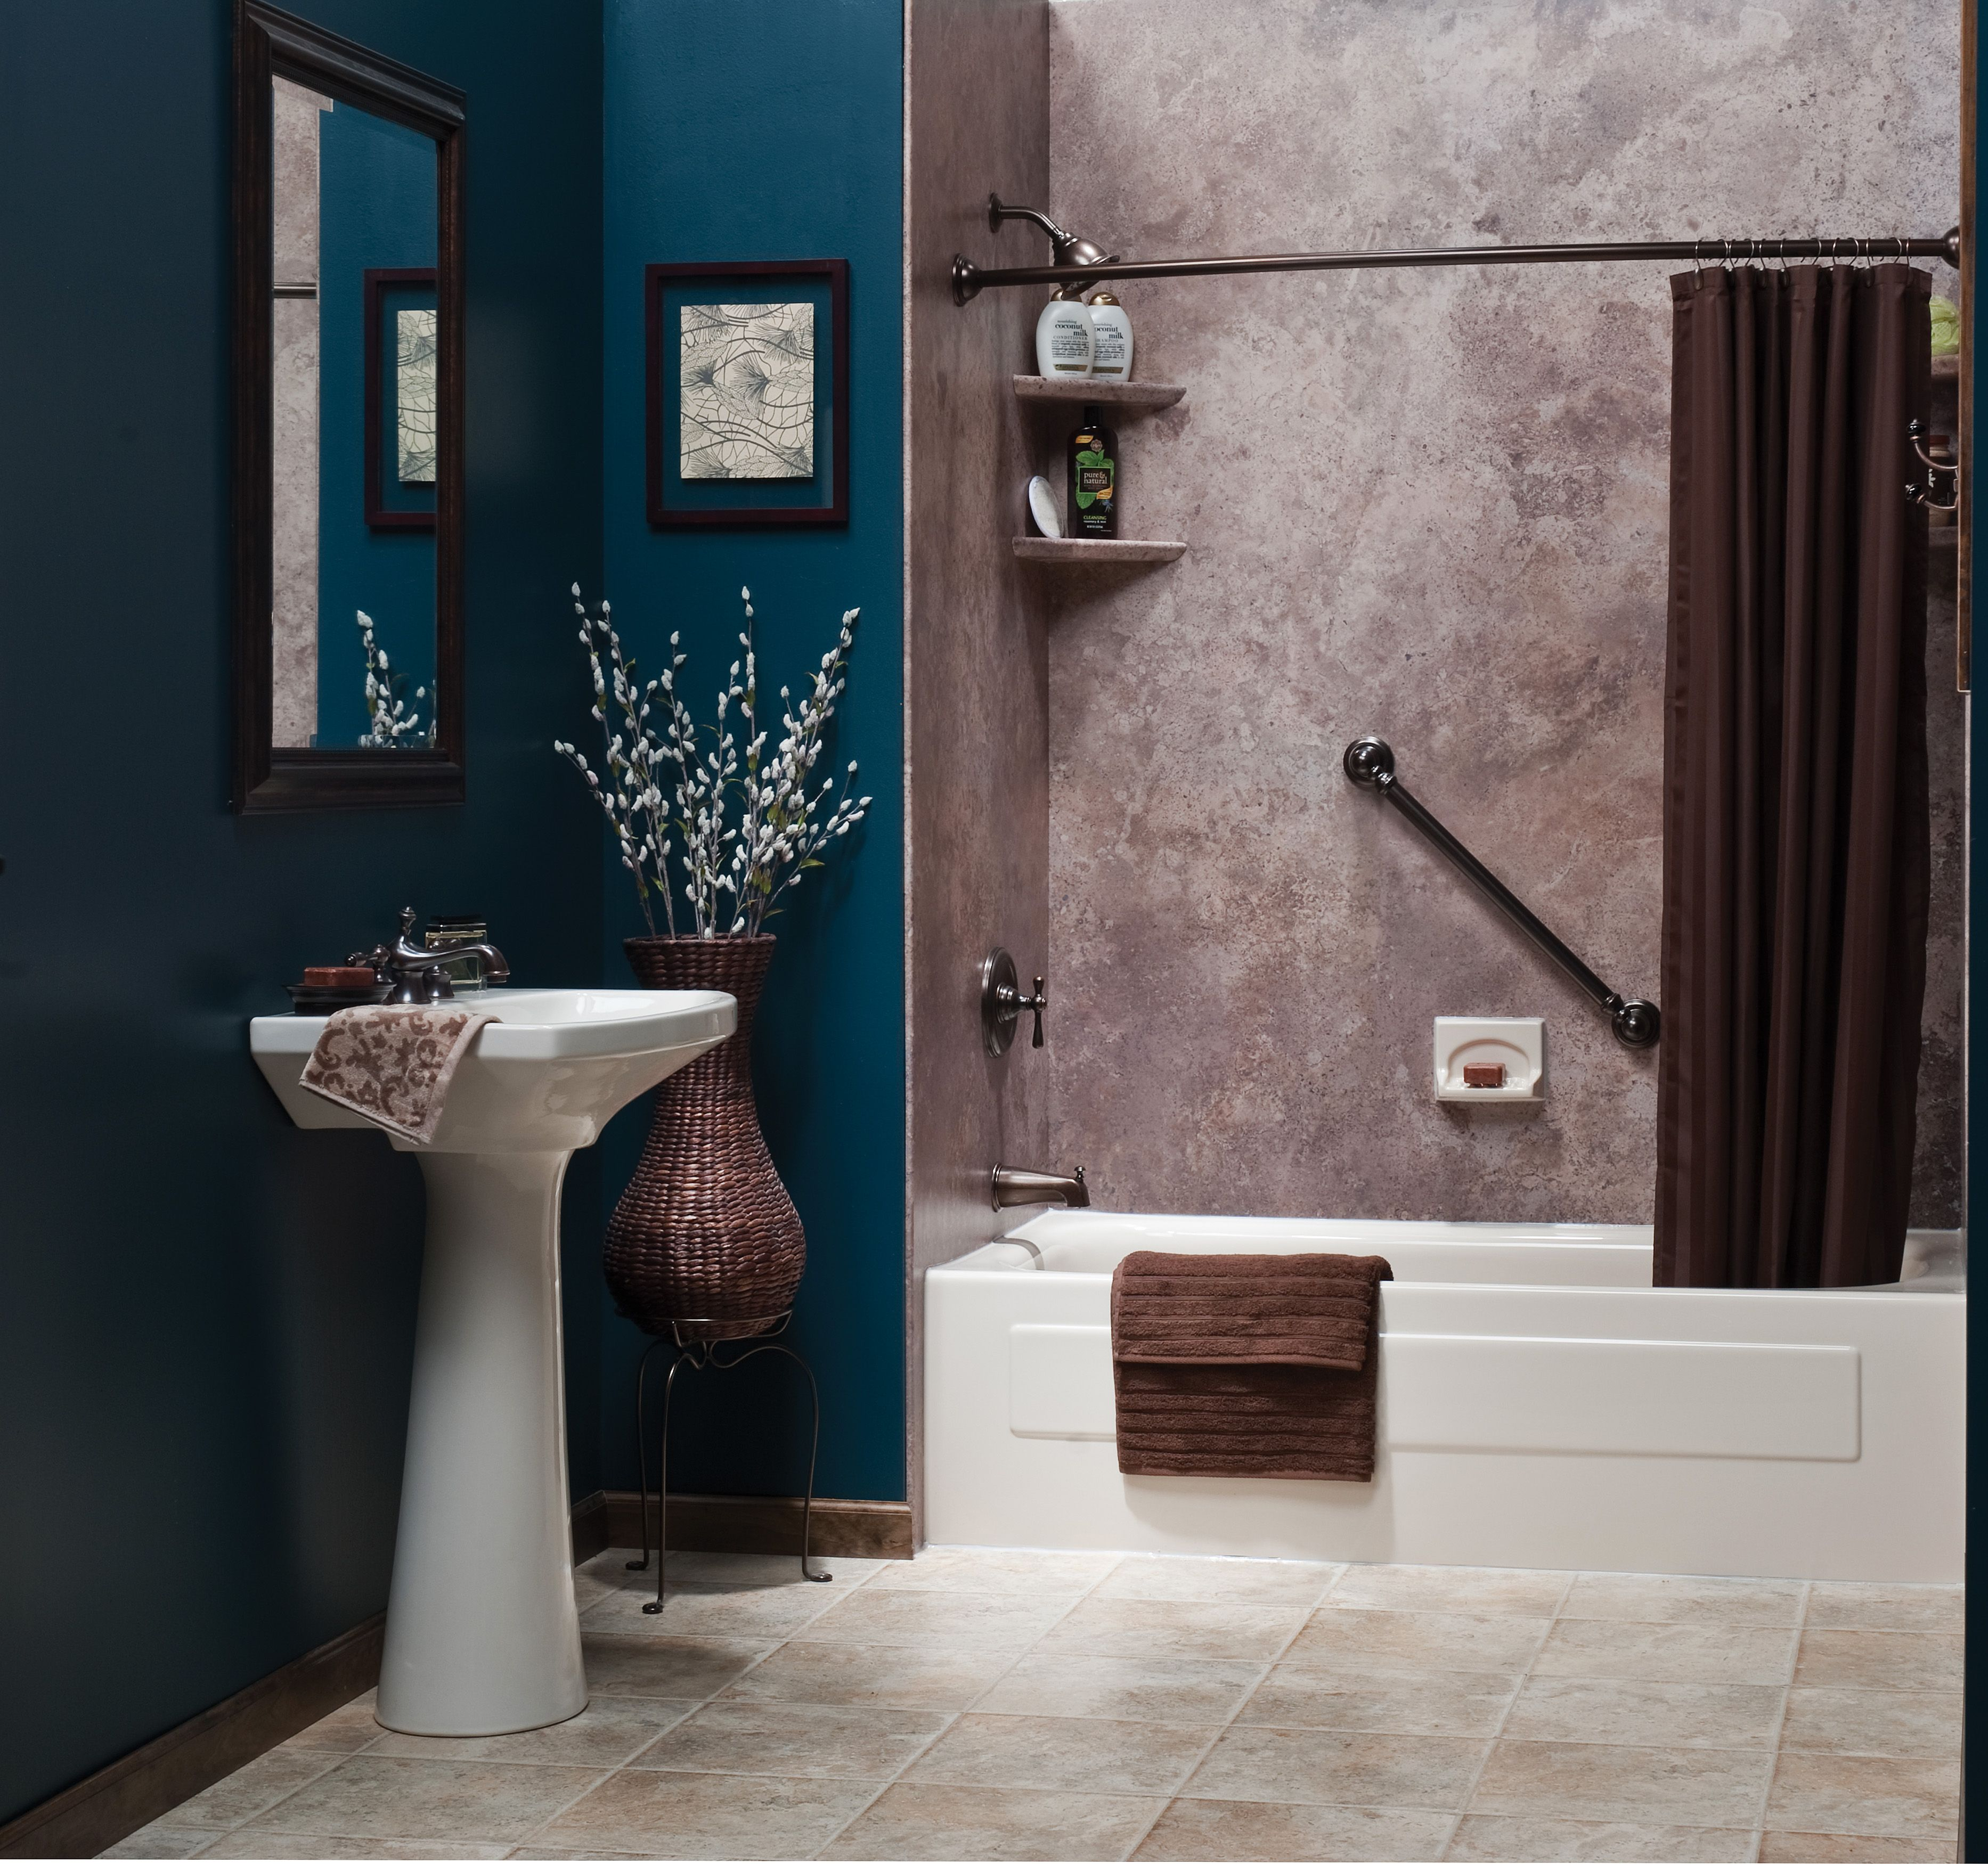 county interior remodeling birmingham remodel monmouth master bathroom al renovation nj gallery decoration new spirit je